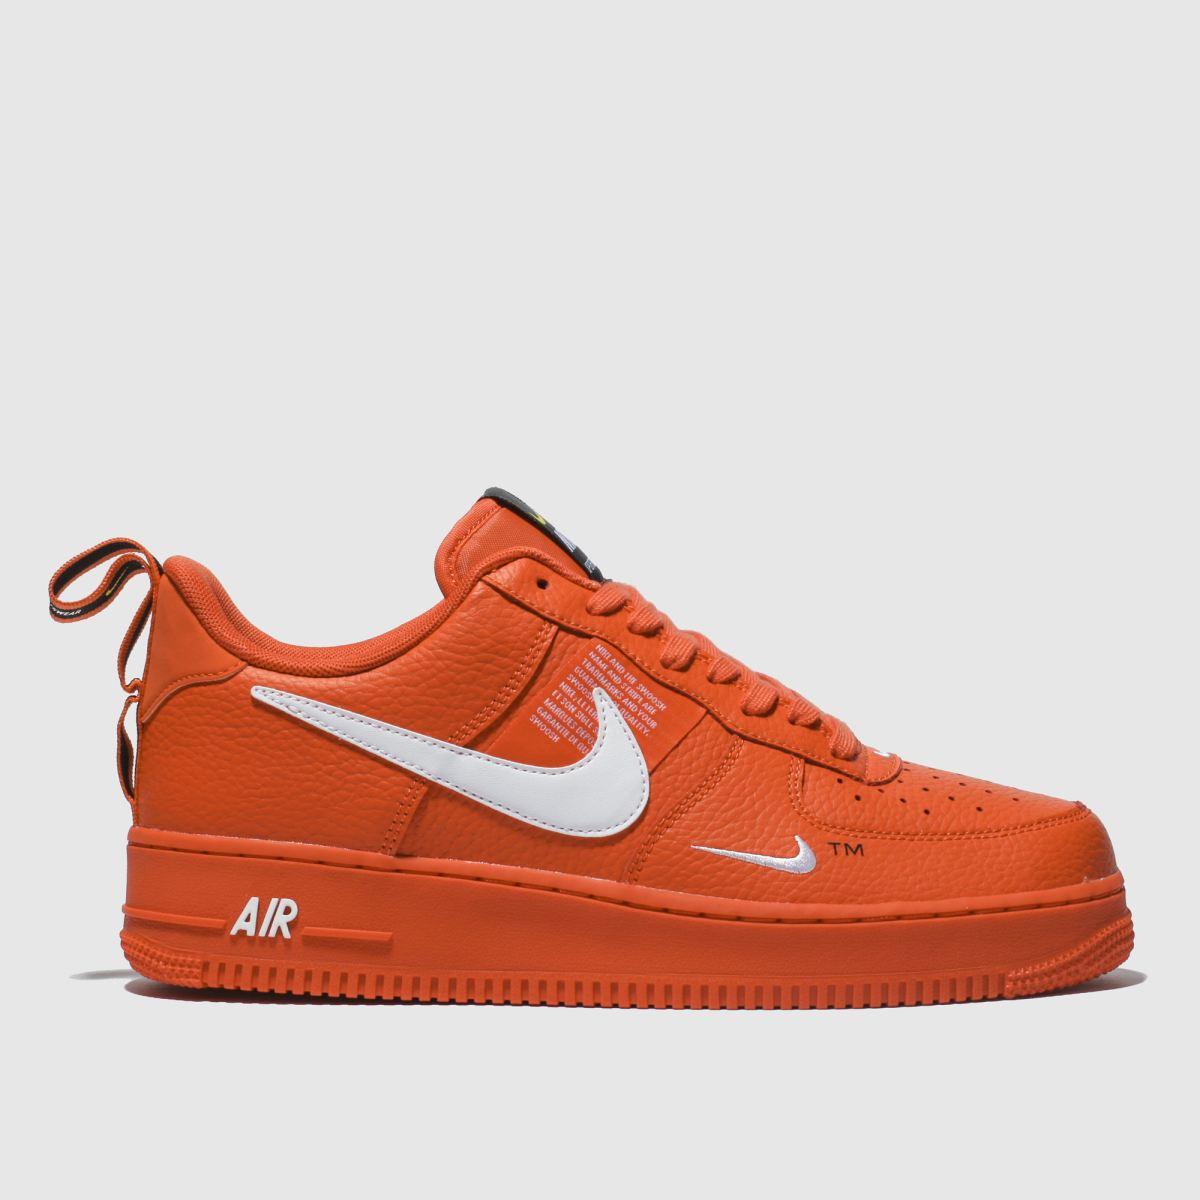 Nike Orange Air Force 1 07 Lv8 Utility Trainers